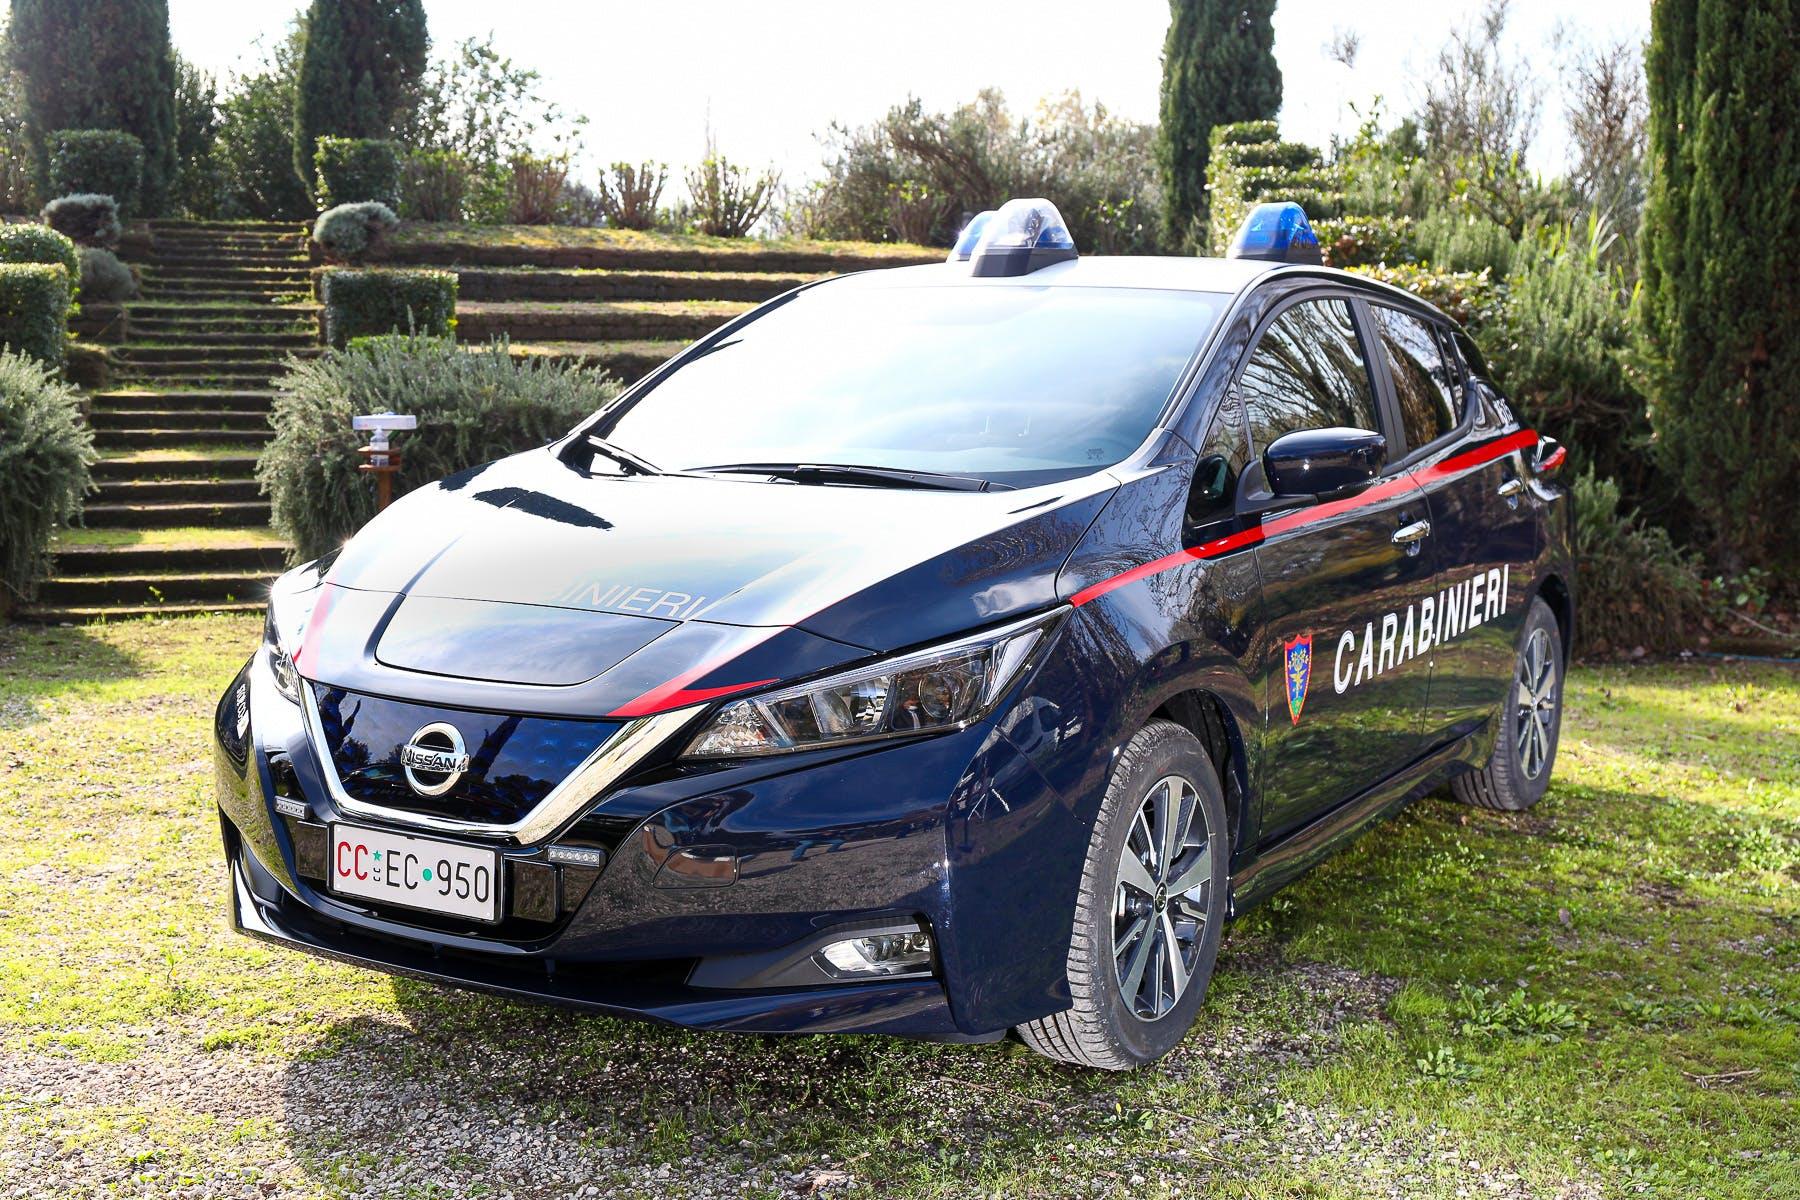 Nissan Leaf Arma dei Carabinieri